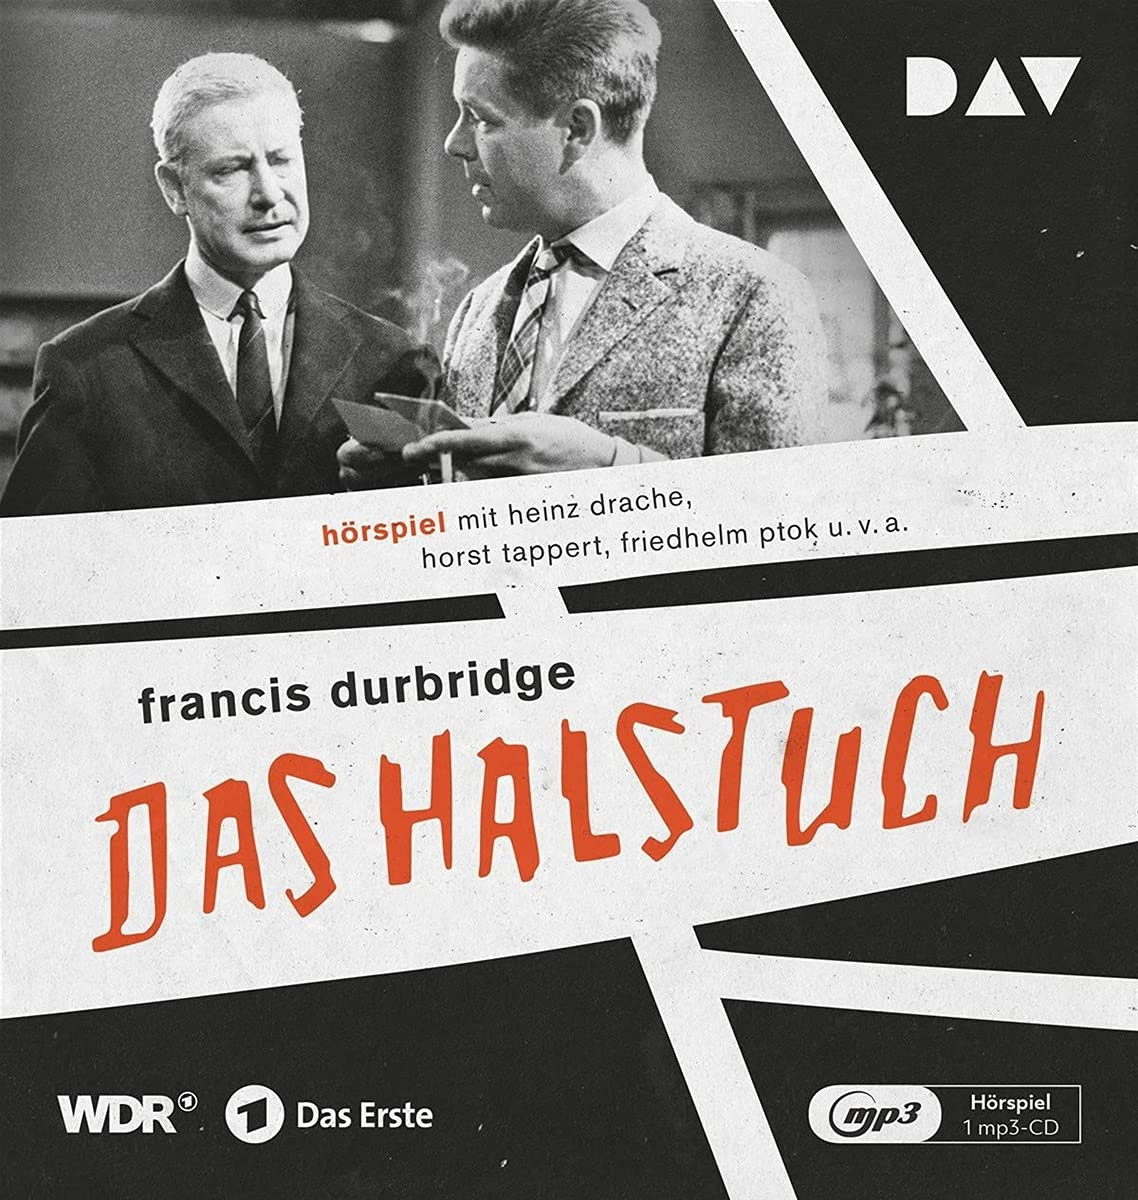 Francis Durbridge - Das Halstuch (Hörspiel WDR)